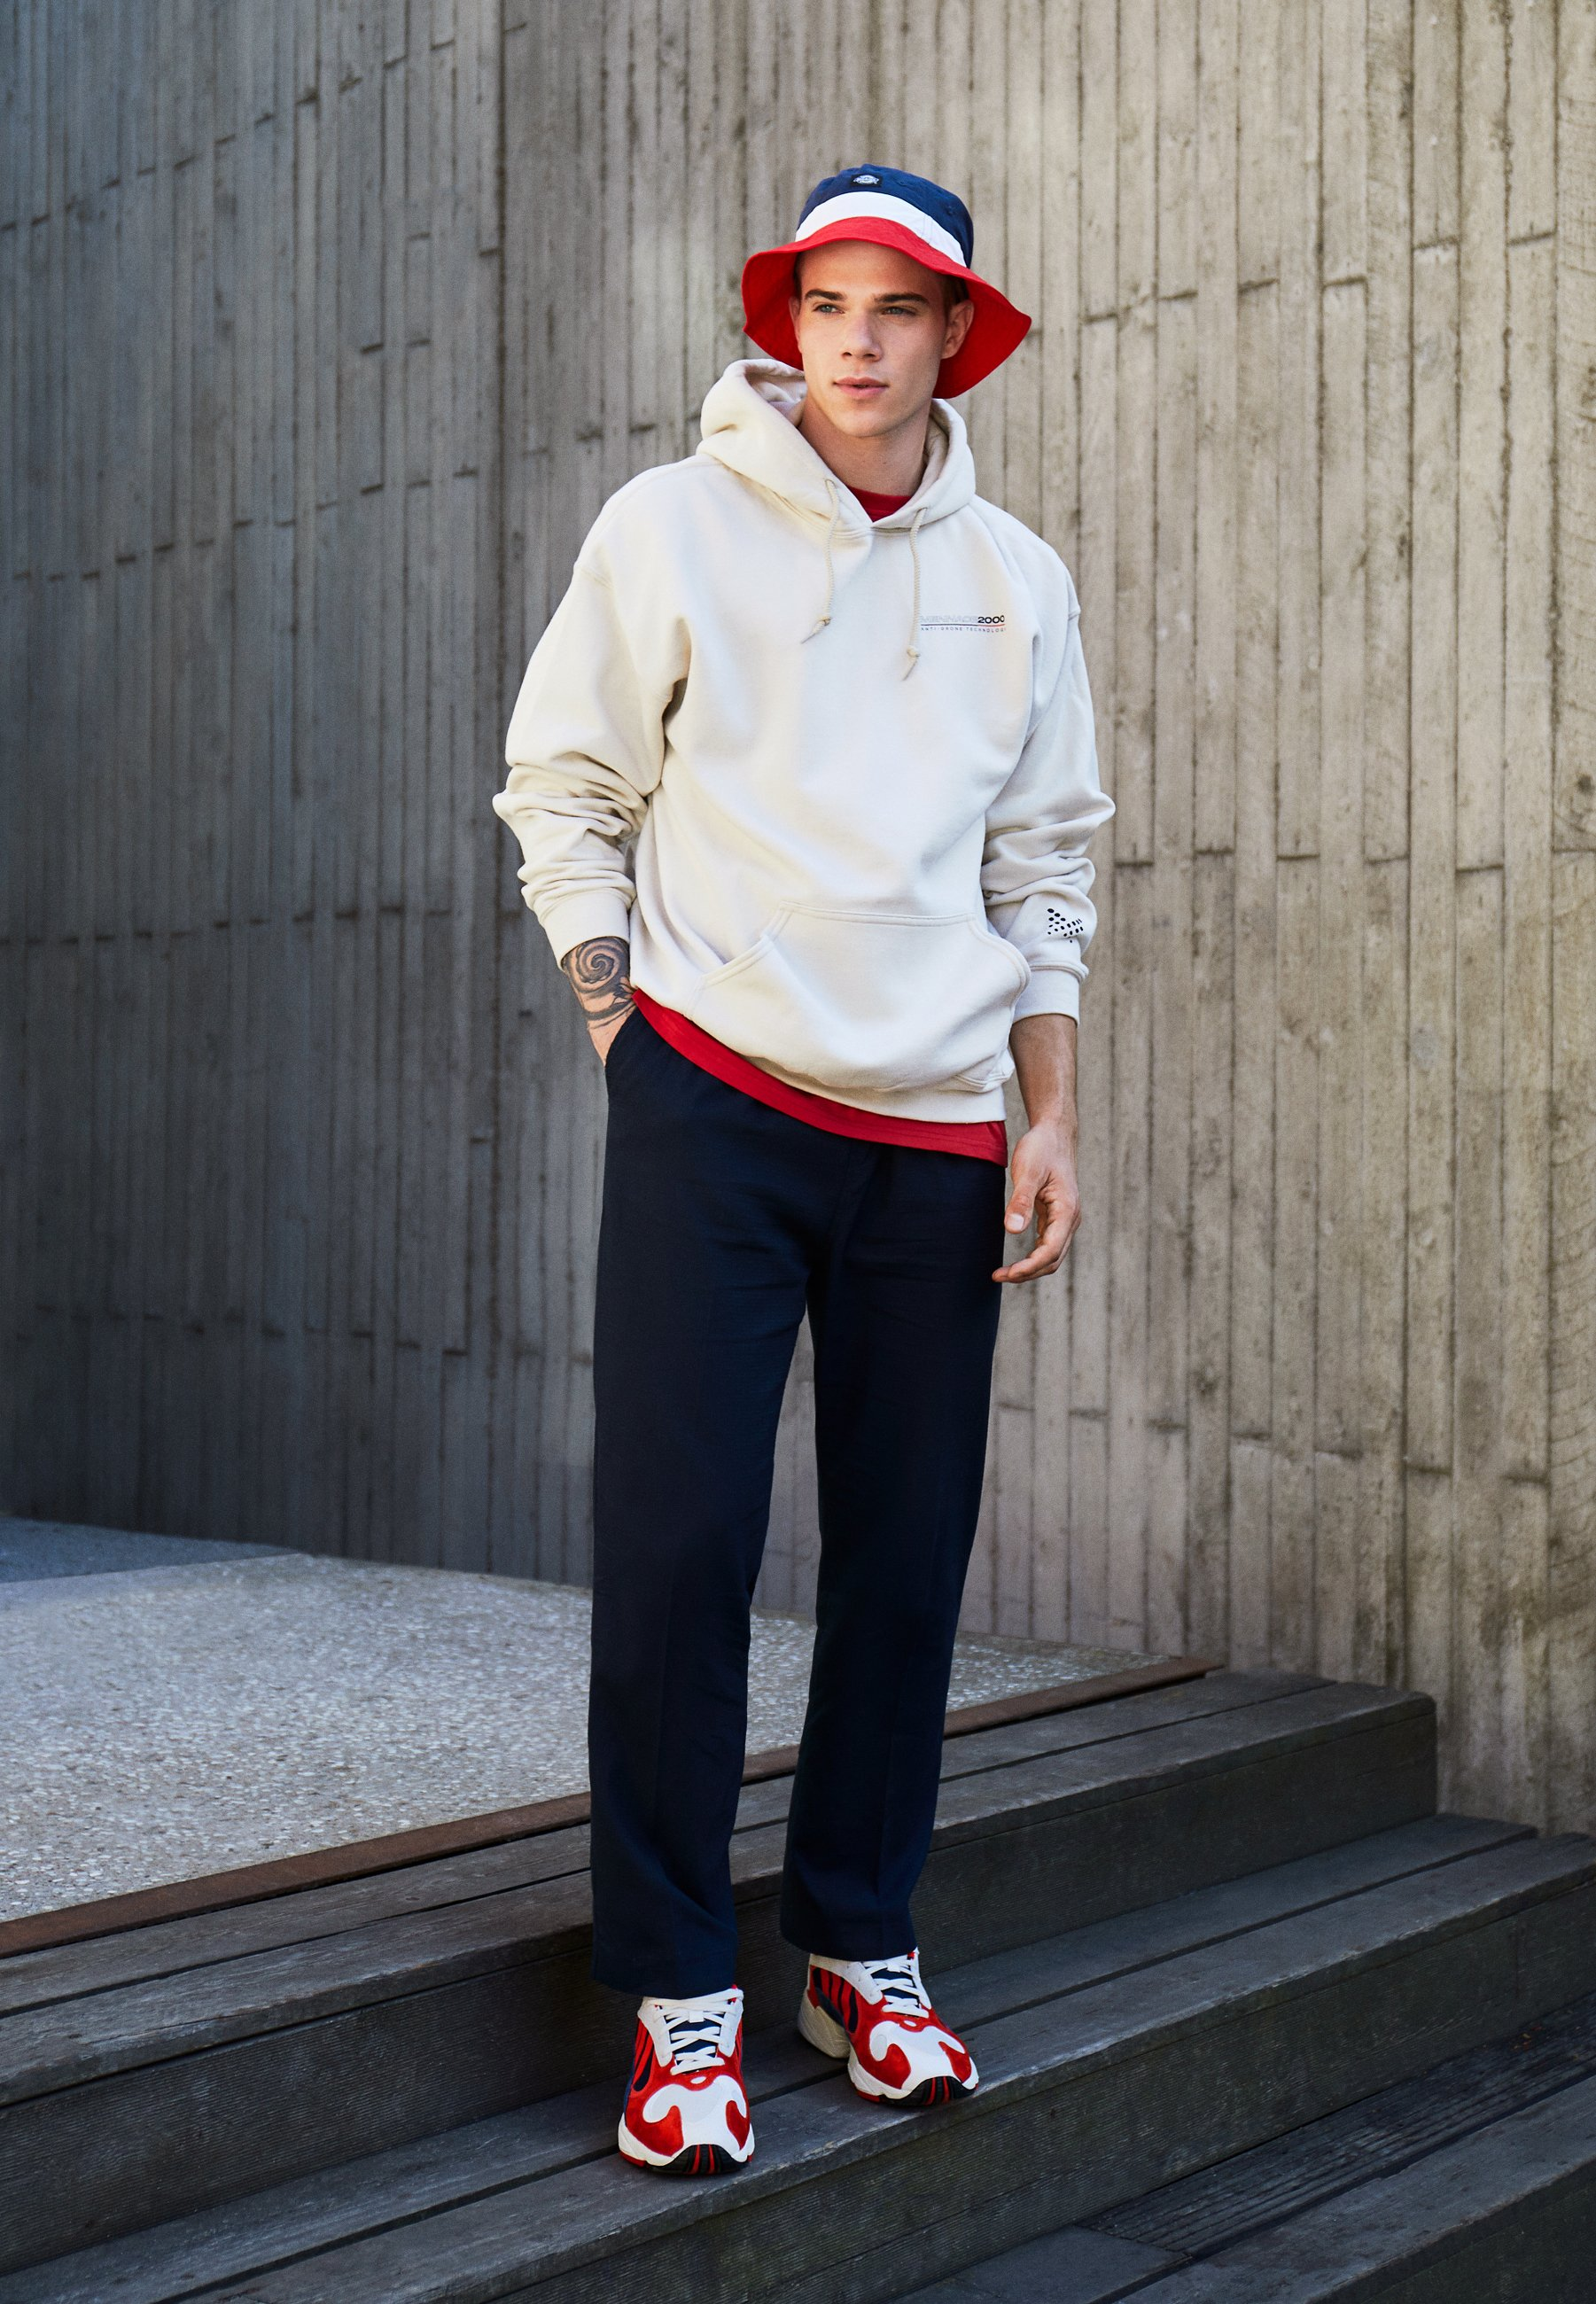 Originals Basses collegiate core Black Adidas White Yung 1Baskets Navy 4jAR5L